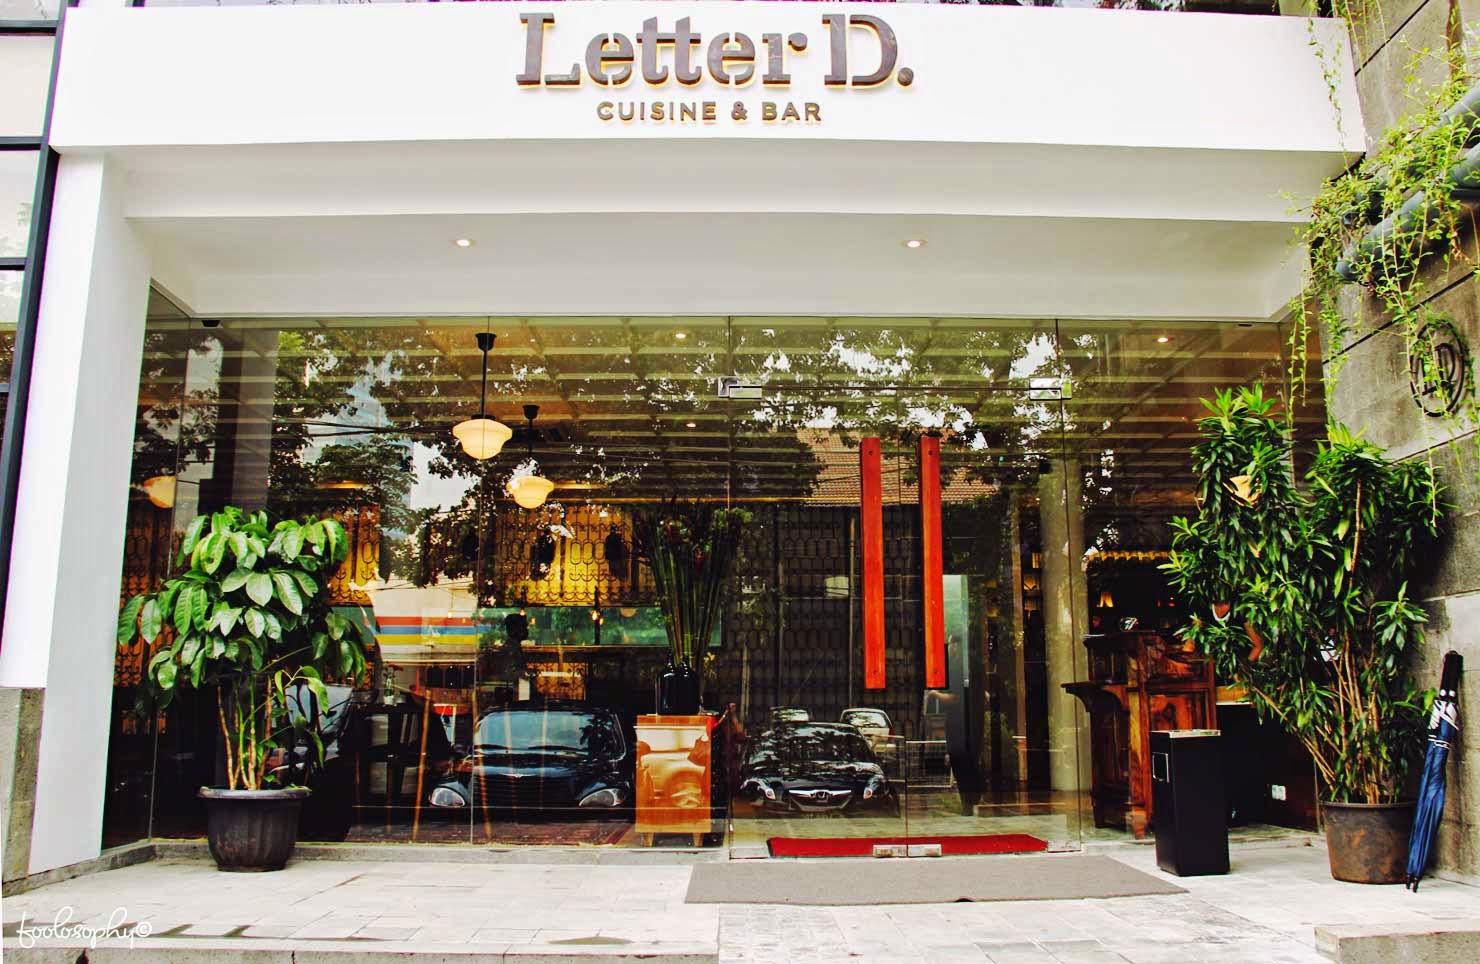 Restoran Letter D (aline-aline-aline.blogspot.co.id)